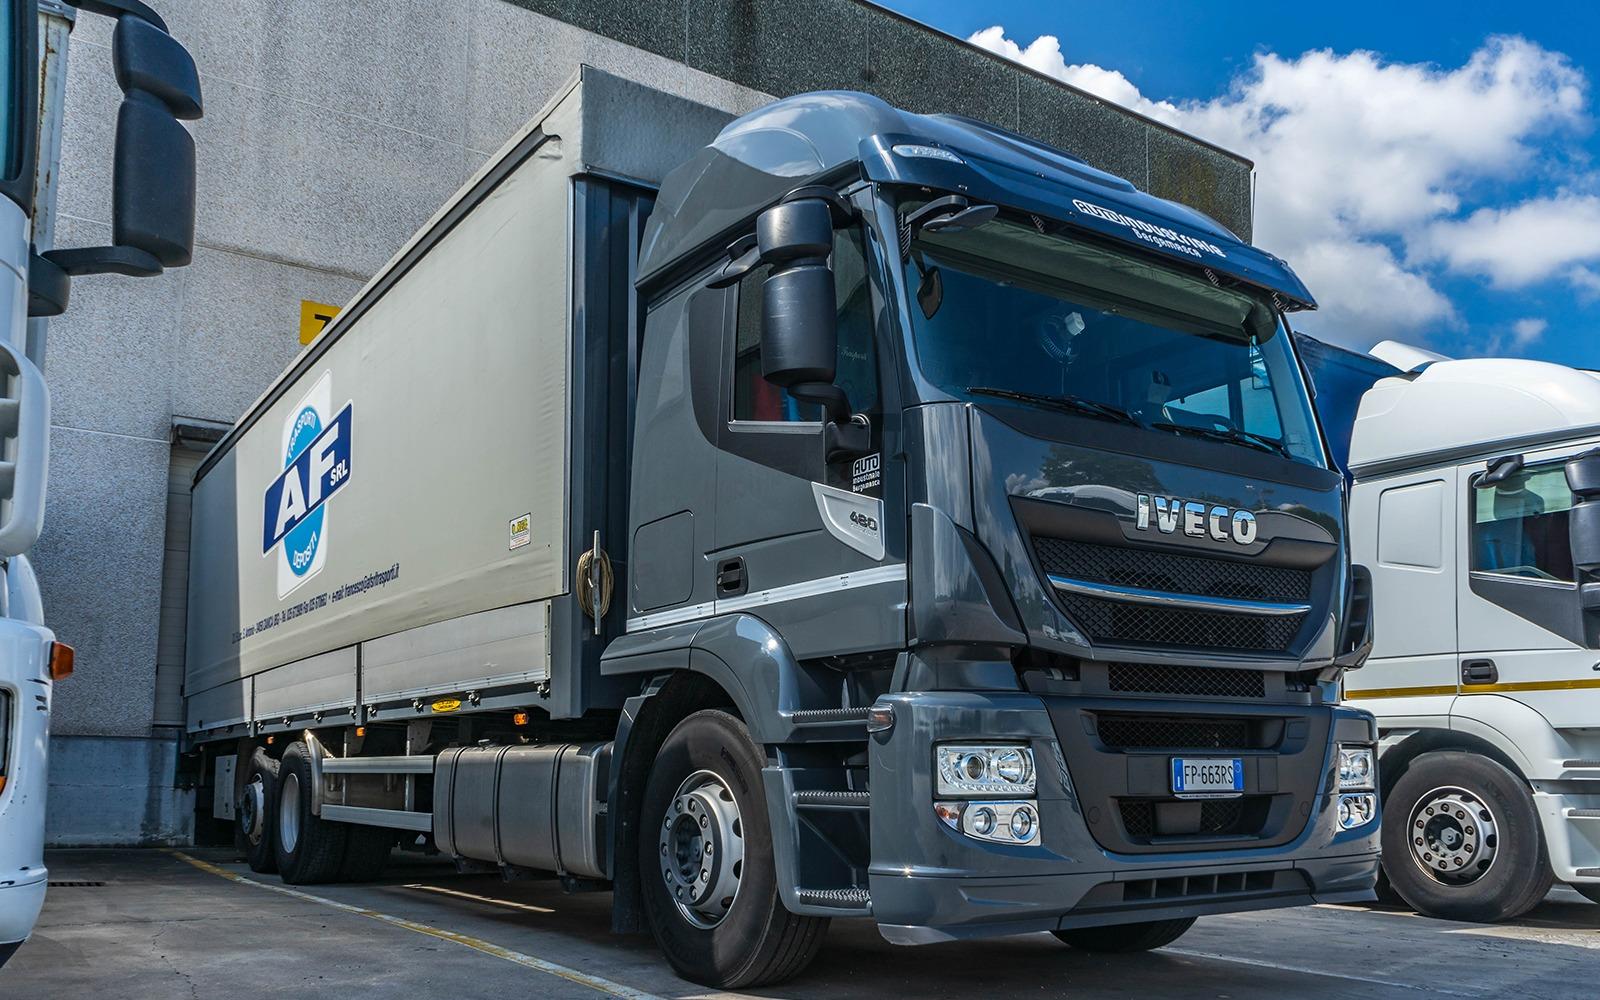 parco mezzi camion af trasporti depositi bergamo